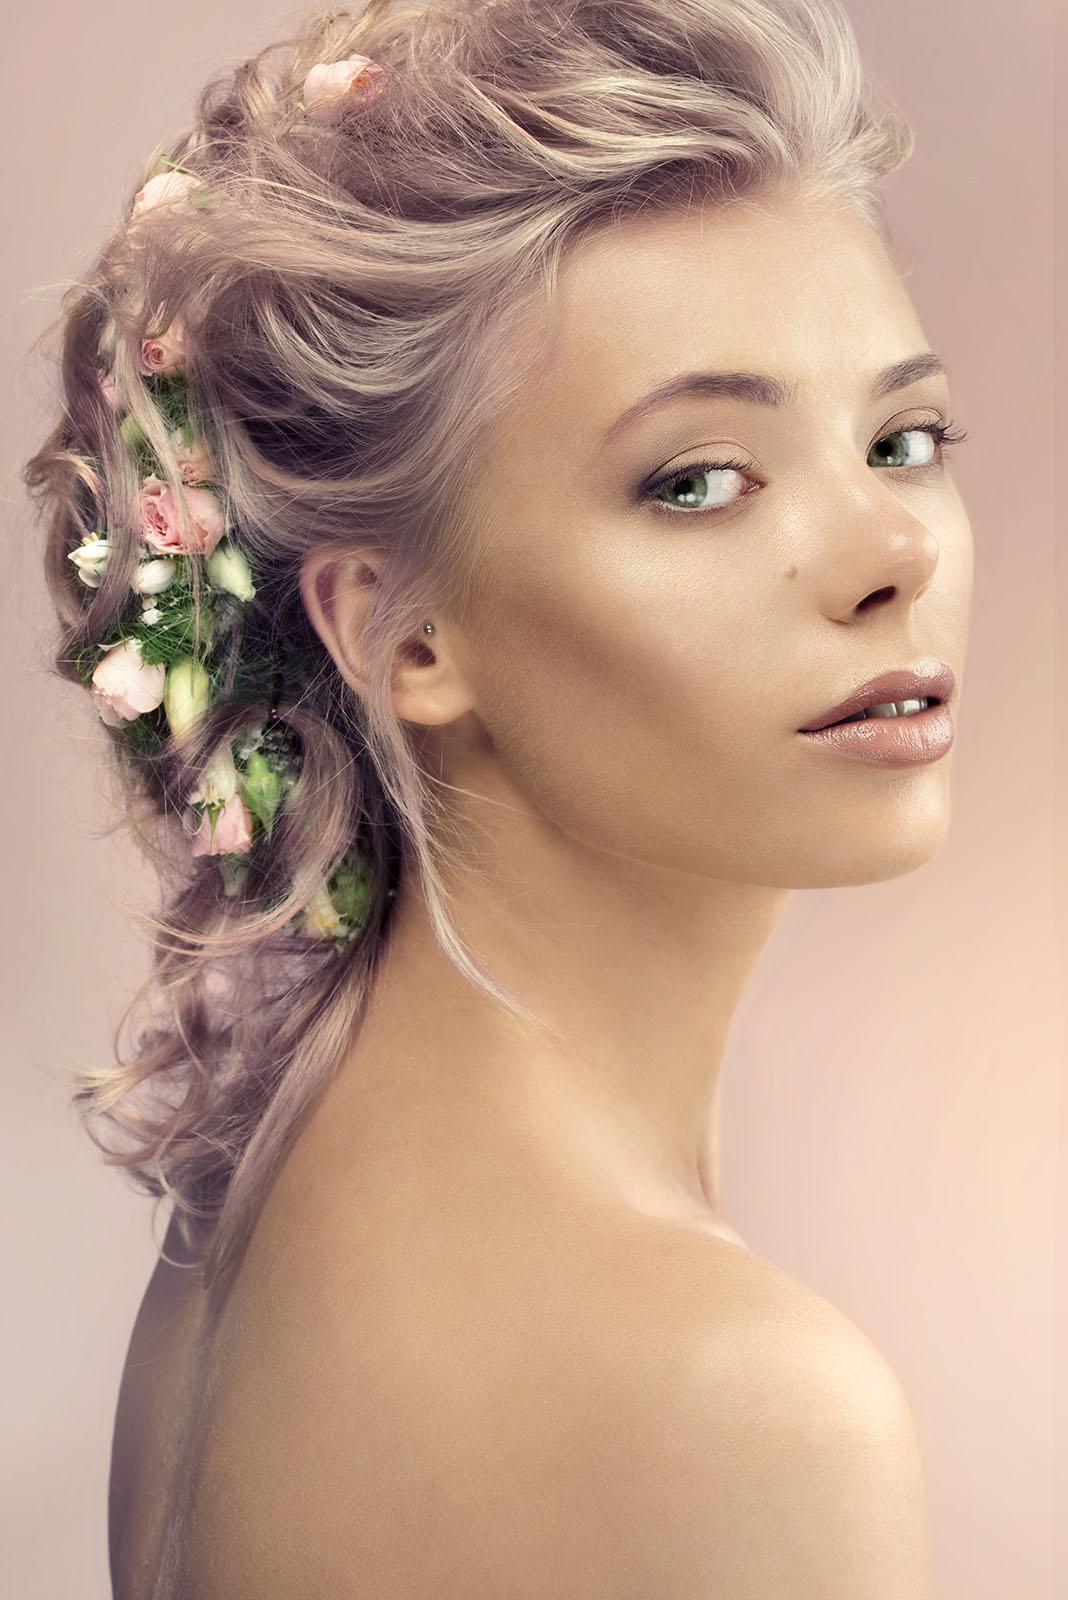 Beauty_photographer_italia